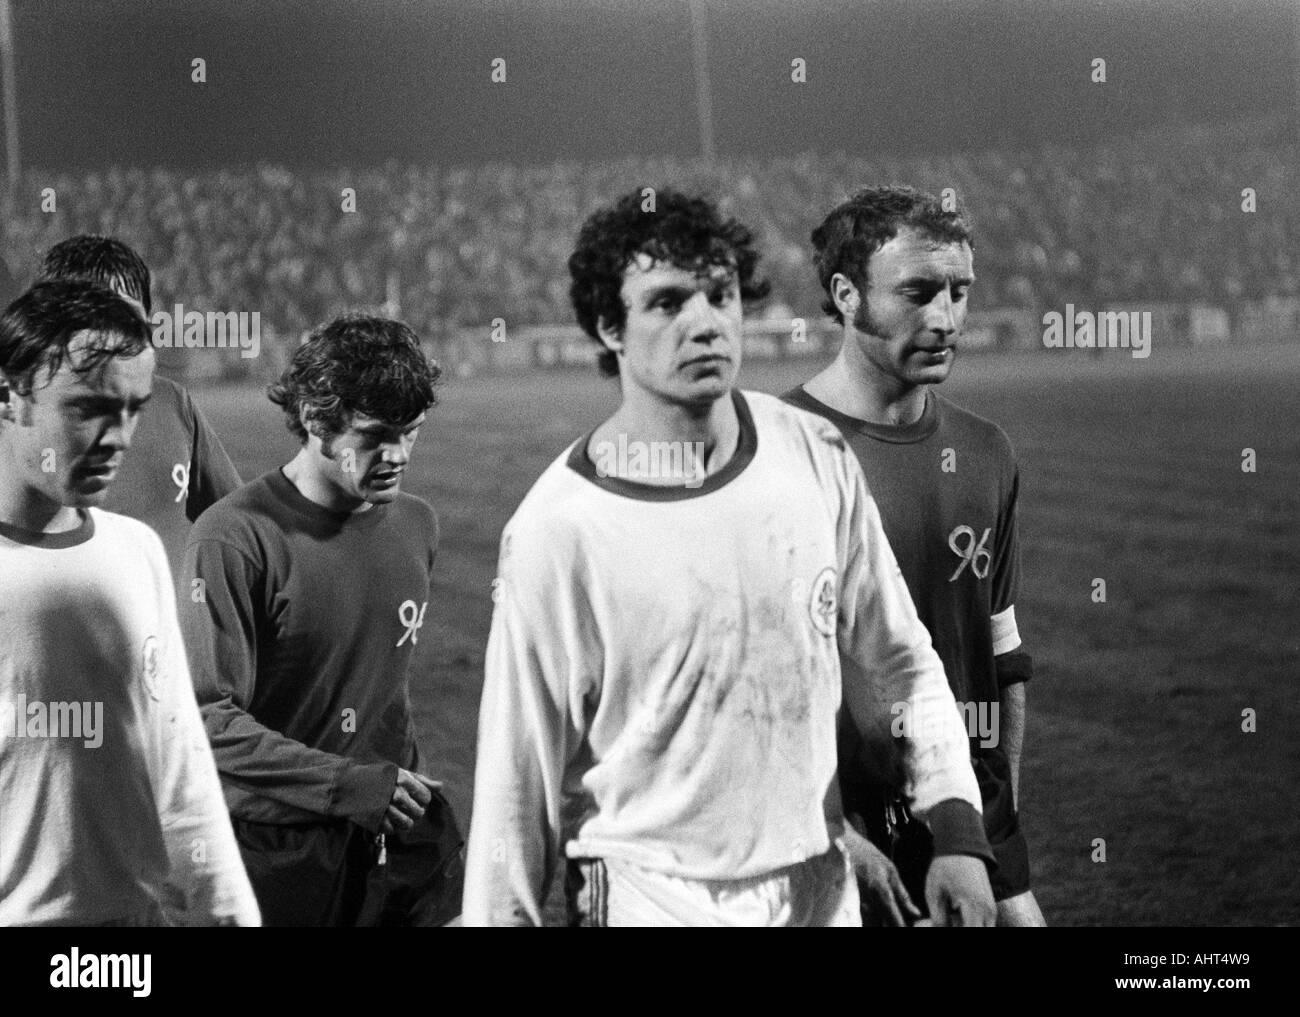 football, Bundesliga, 1970/1971, Niederrhein Stadium, Rot-Weiss Oberhausen versus Hanover 96 4:3, football players leaving the pitch, f.l.t.r. Dieter Brozulat (RWO), Rainer Stiller (96), Reiner Hollmann (RWO), Hans Siemensmeyer (96) - Stock Image